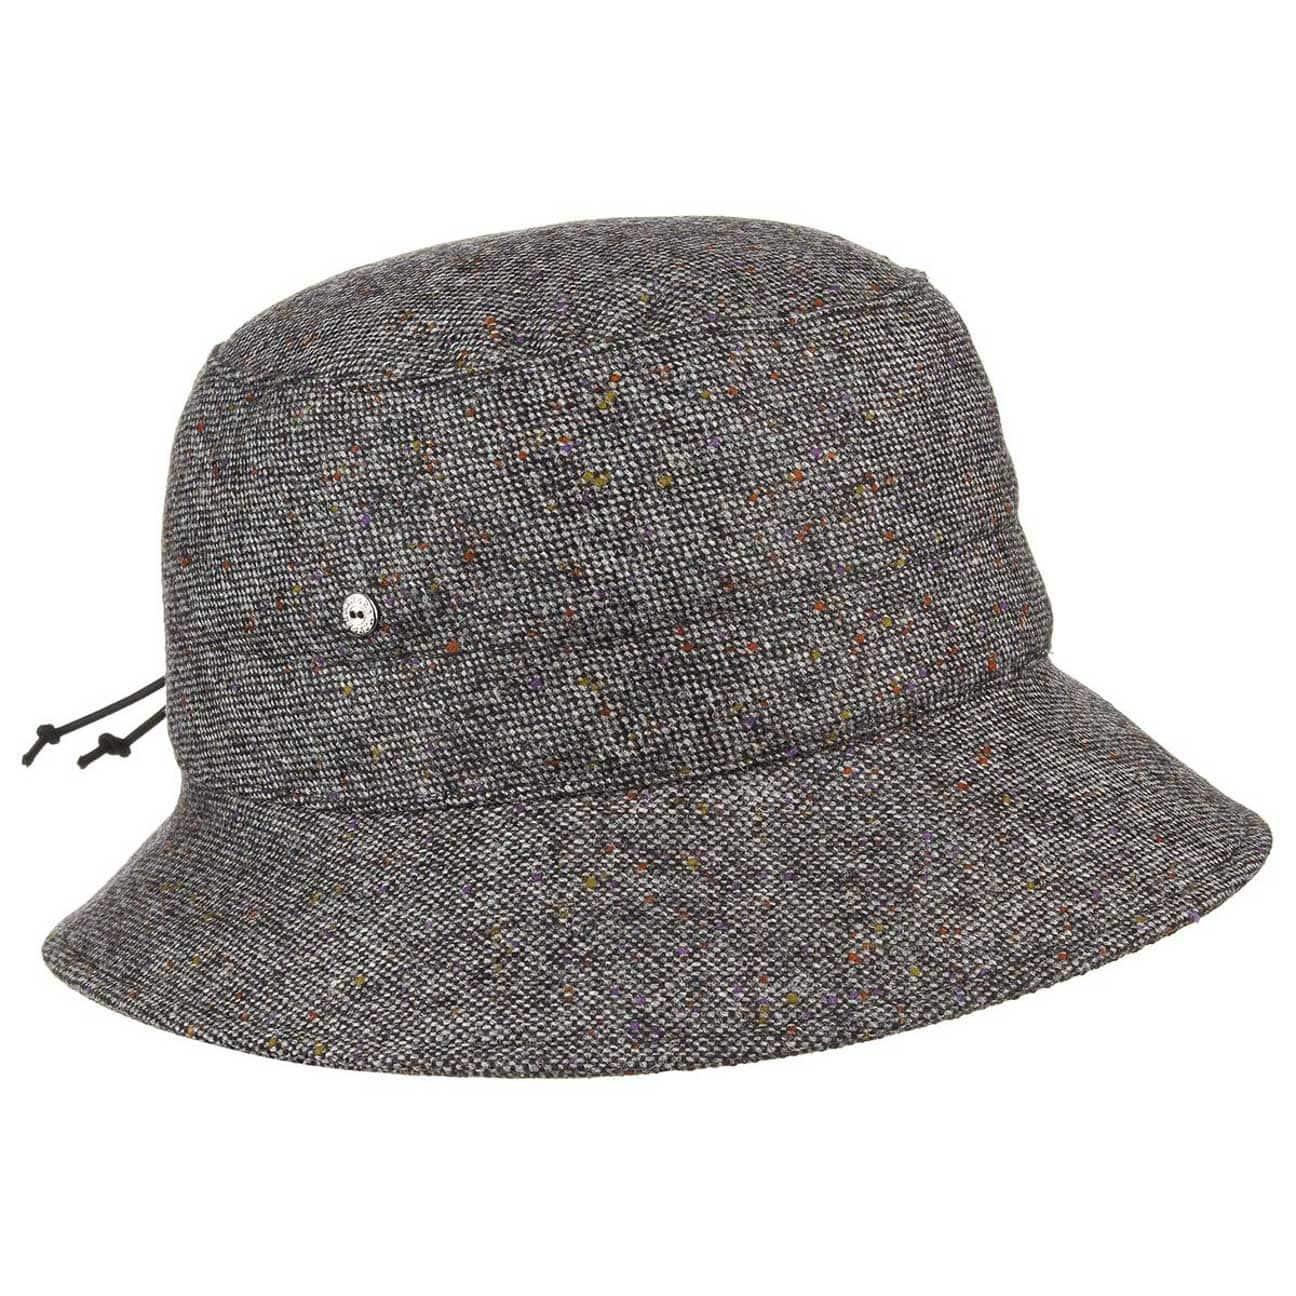 ... Tweed Cappello da Donna by Mayser - antracite 1 1a605c8c76ee